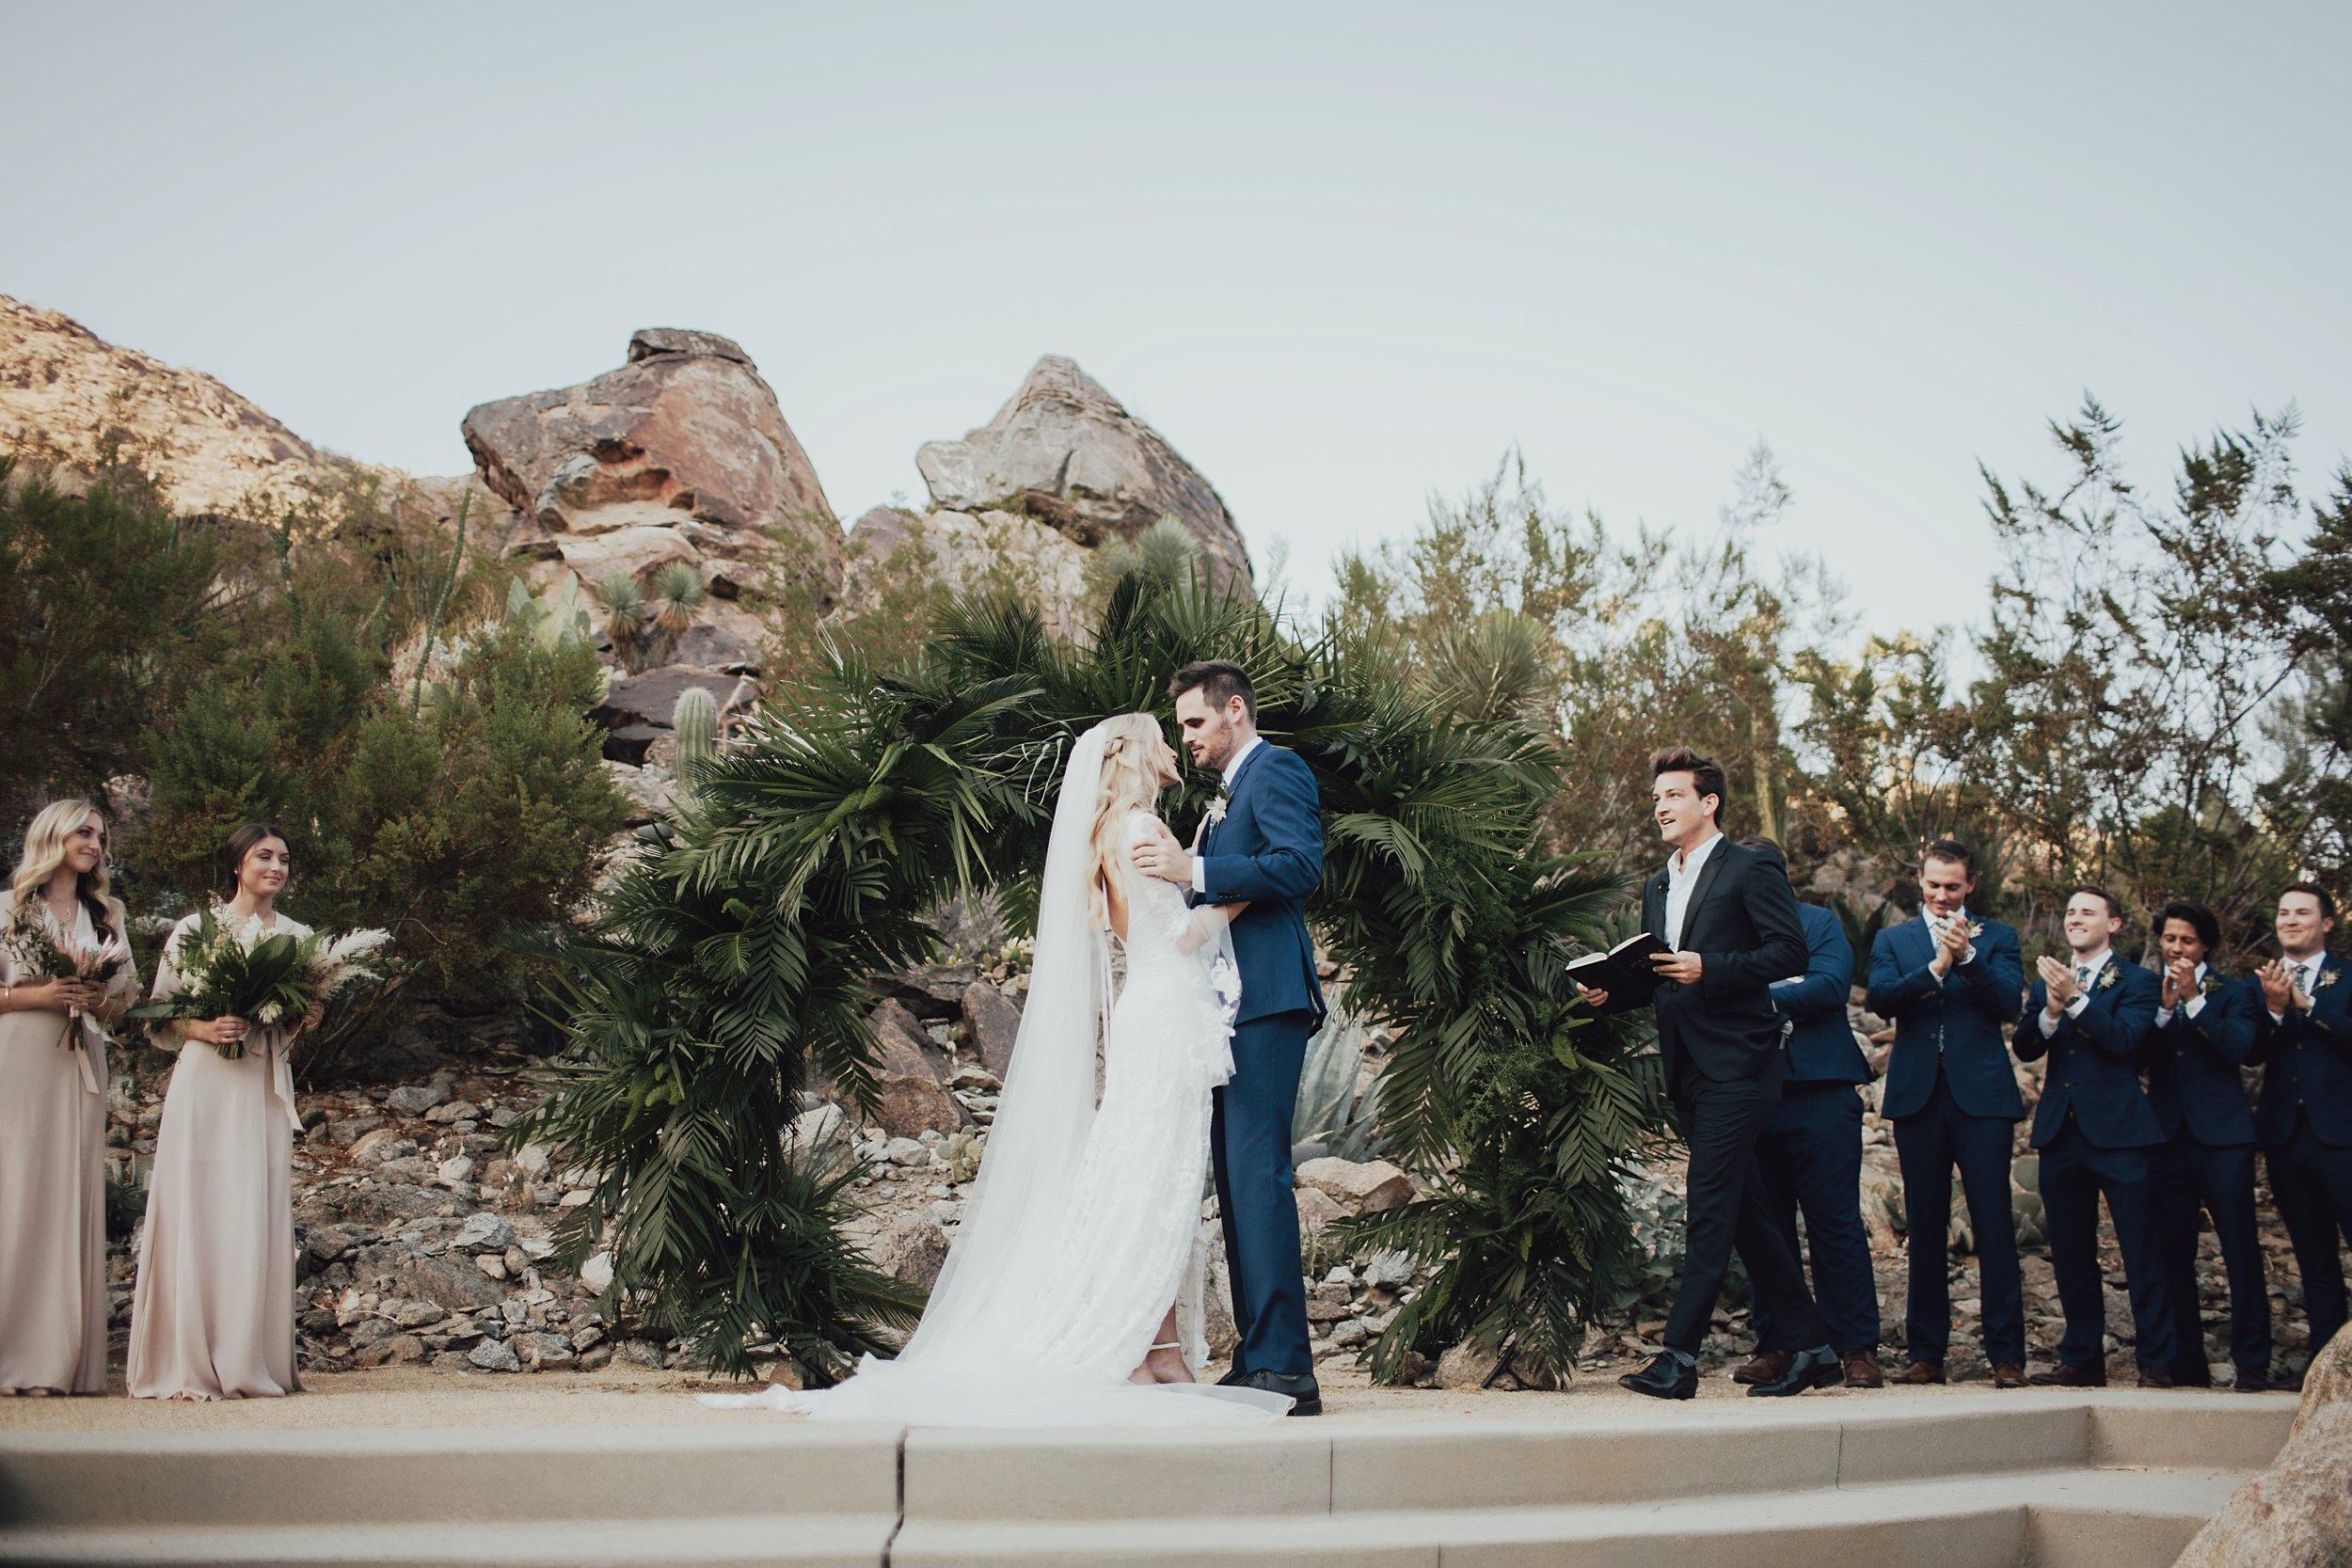 mackenna and mark getting married